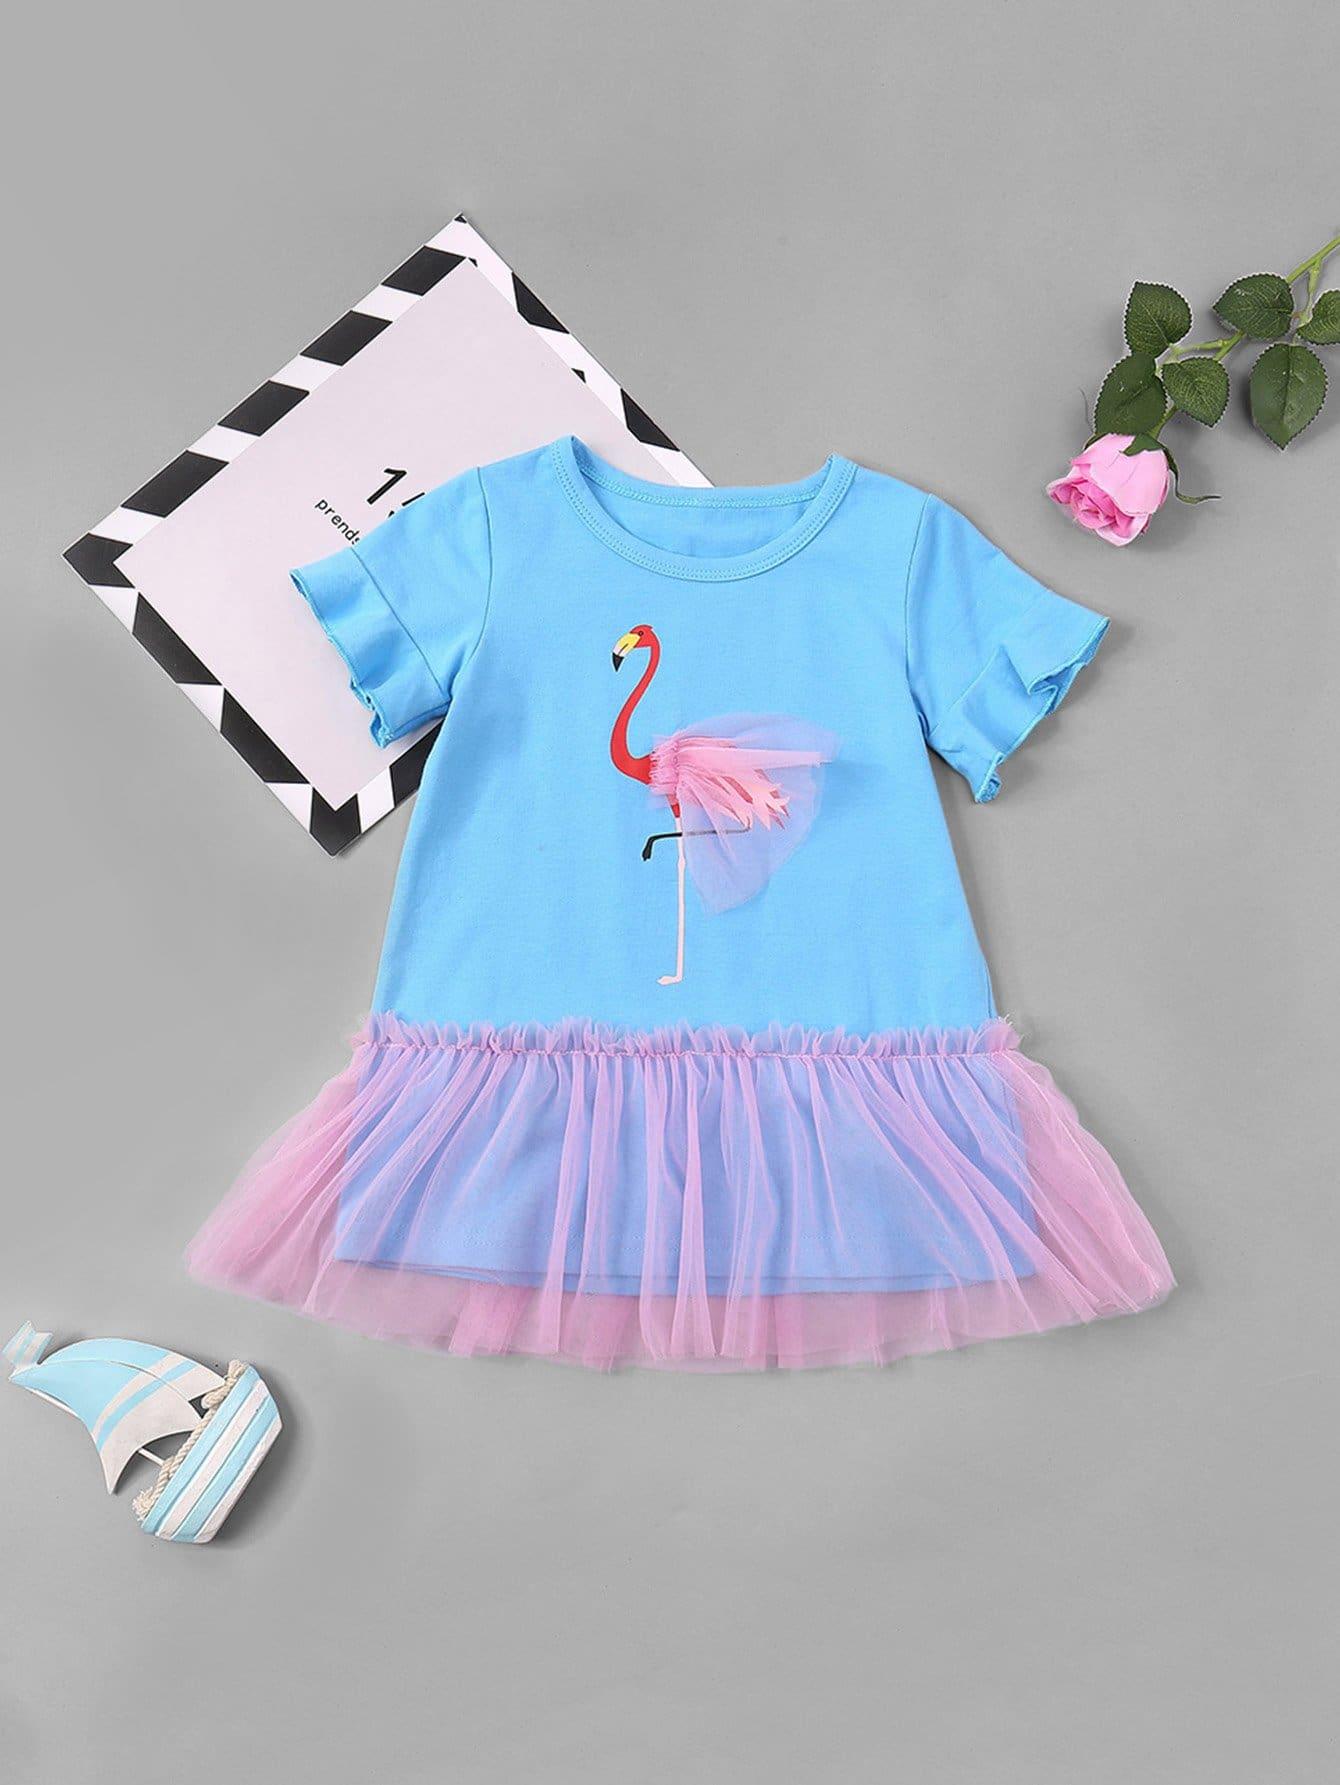 все цены на Girls Flamingo Print Contrast Mesh Tee